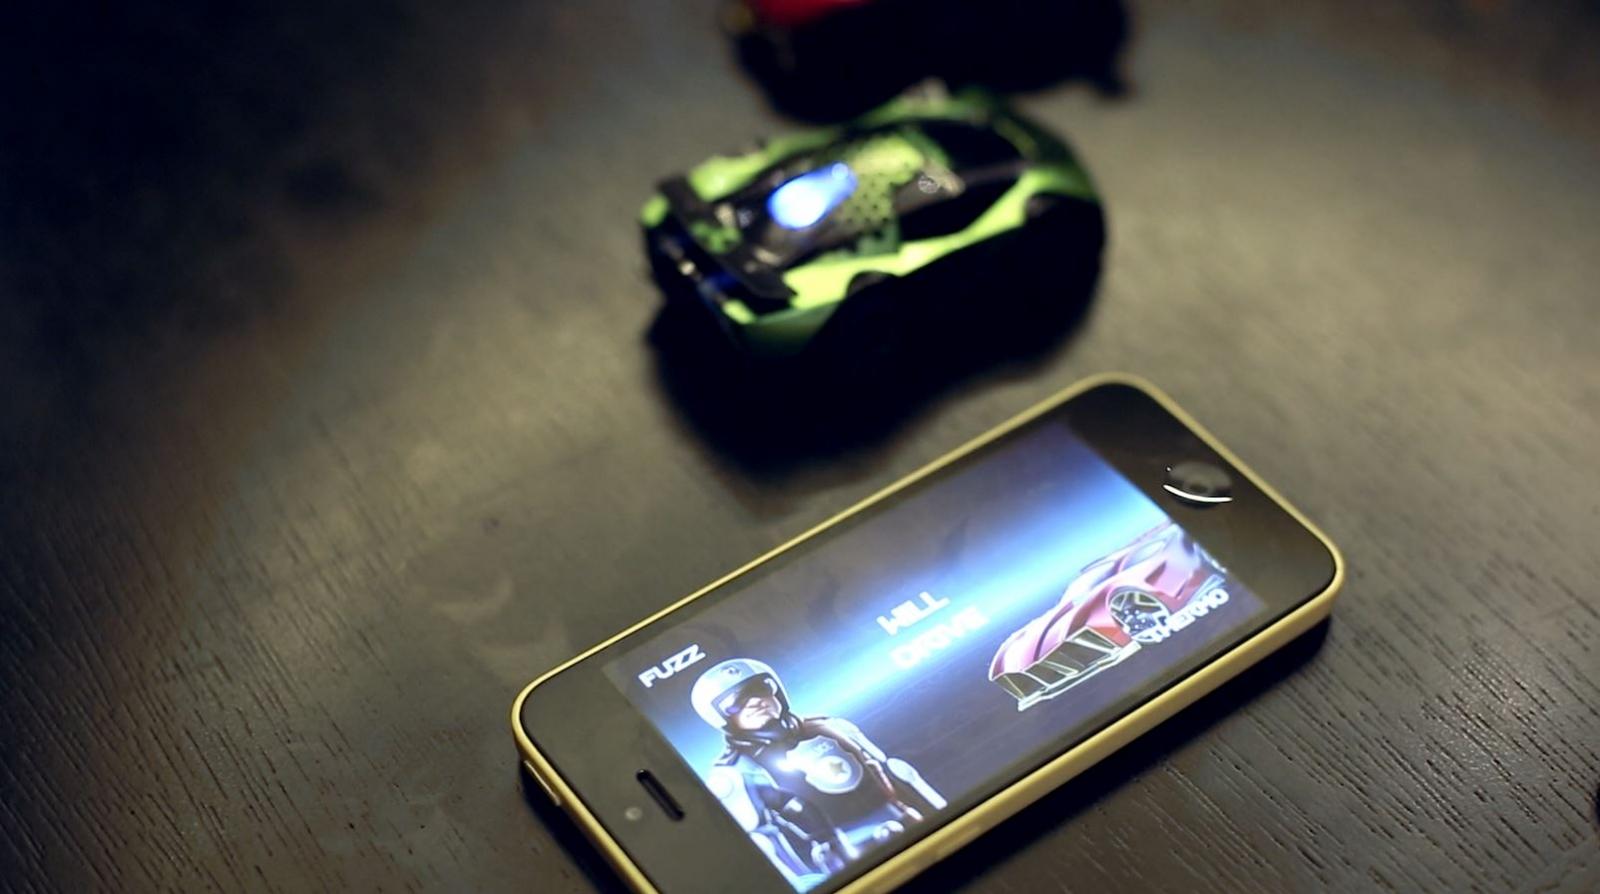 Anki Overdrive app